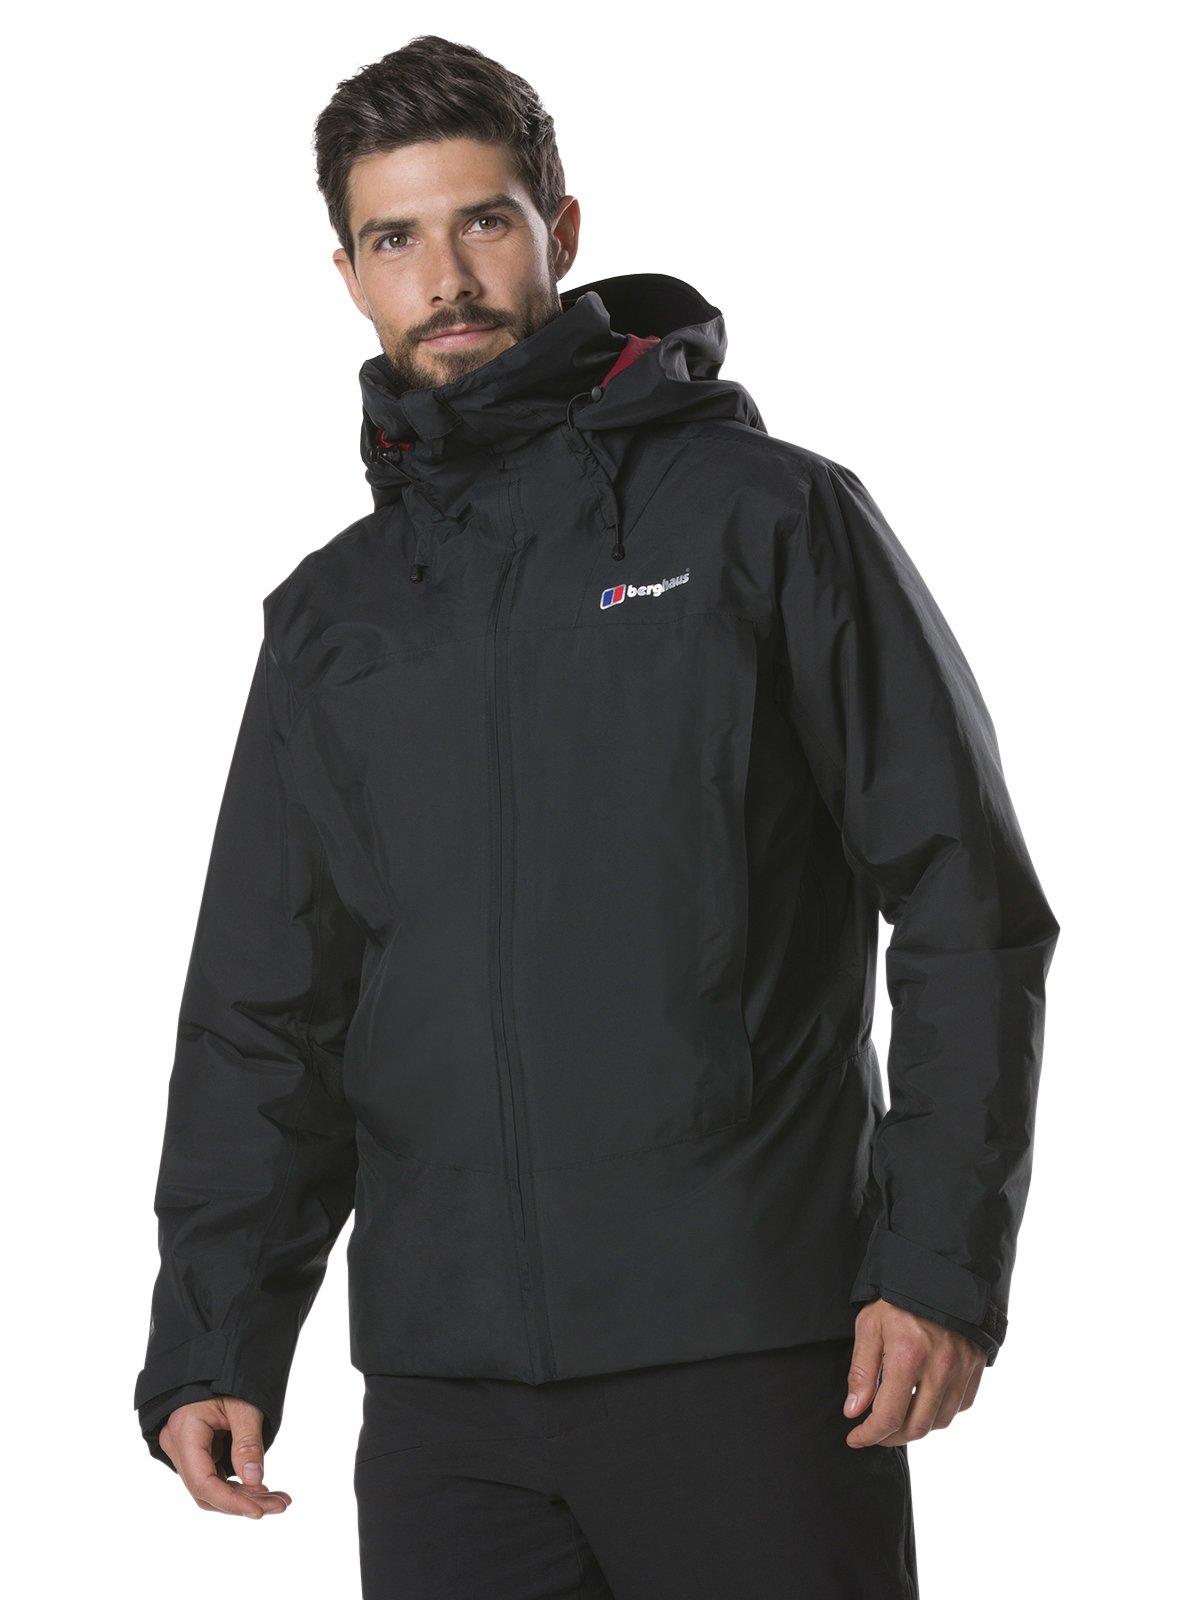 61leHumPySL - Berghaus Men's Helionik Loft Gore-Tex Waterproof Jacket